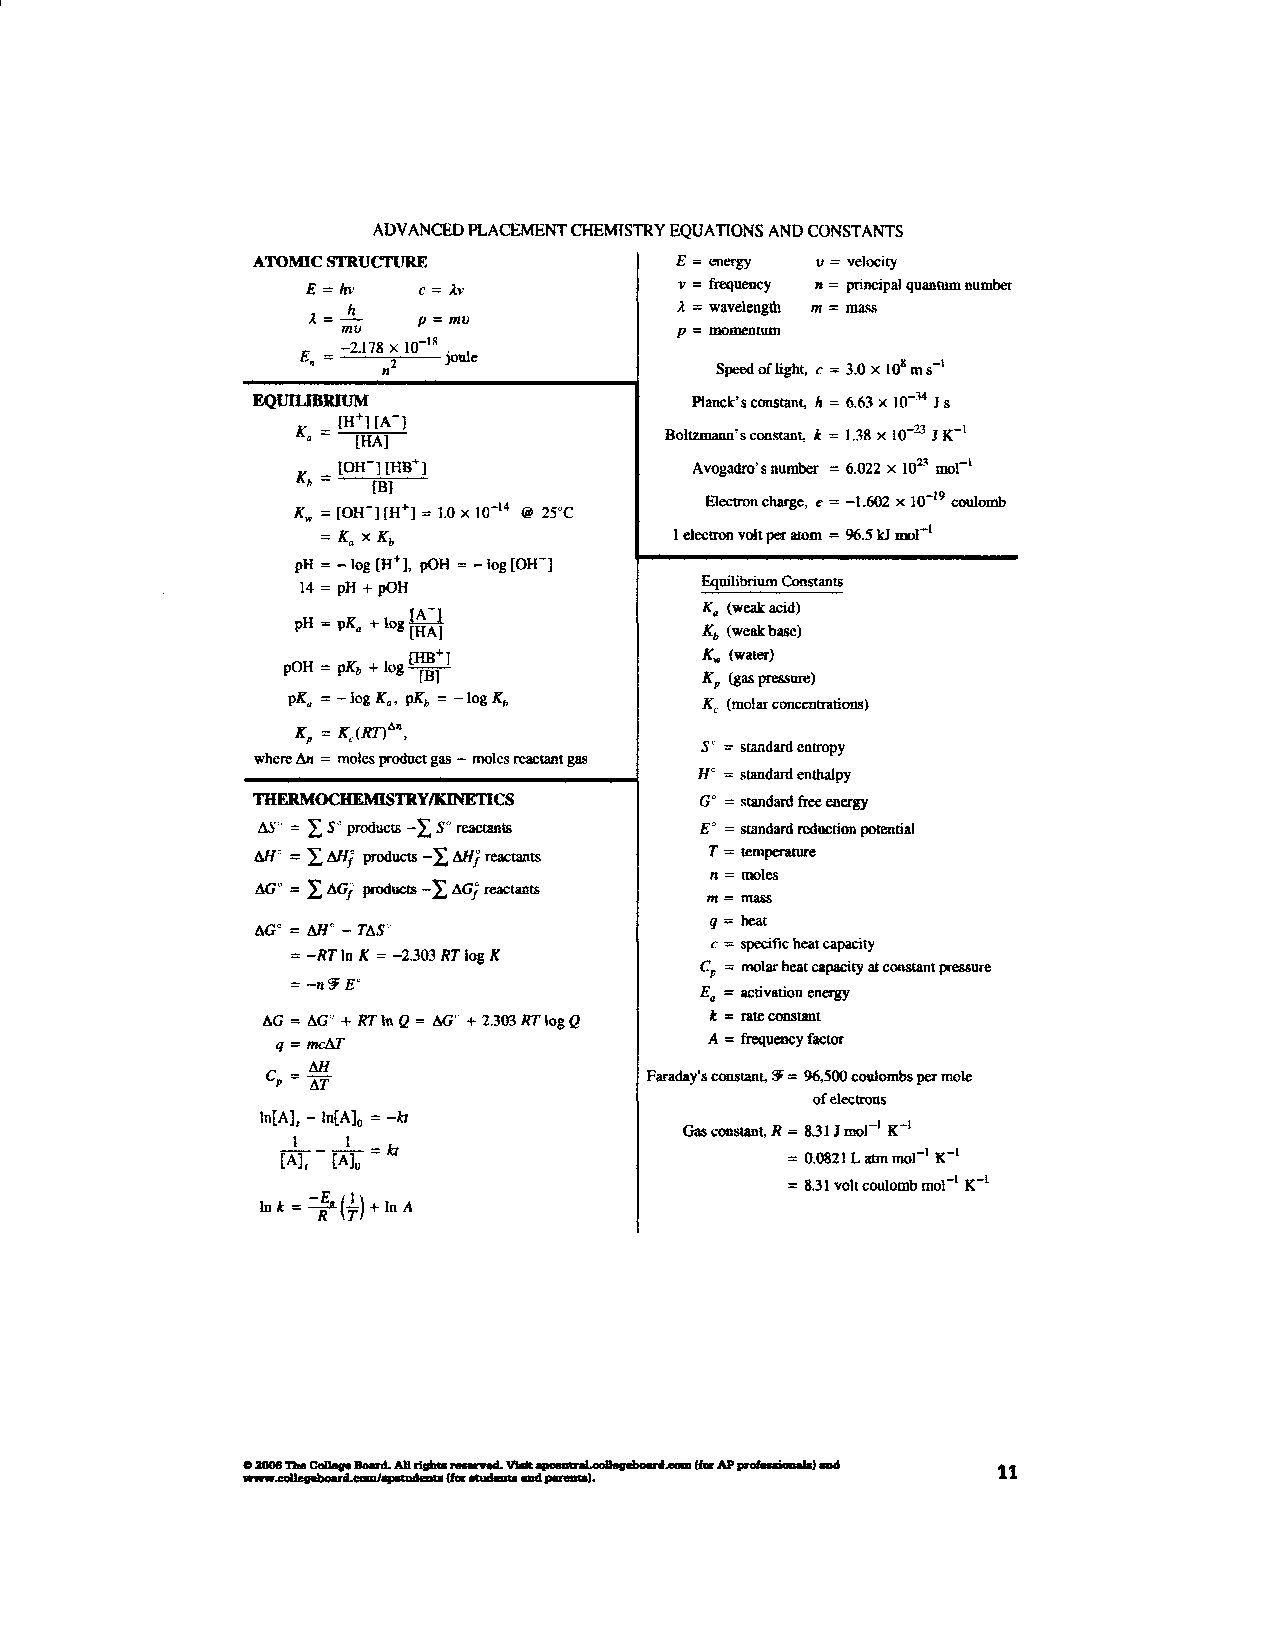 Ap Chemistry Formula Sheet Chemistry Education Teaching Chemistry Science Teaching Resources